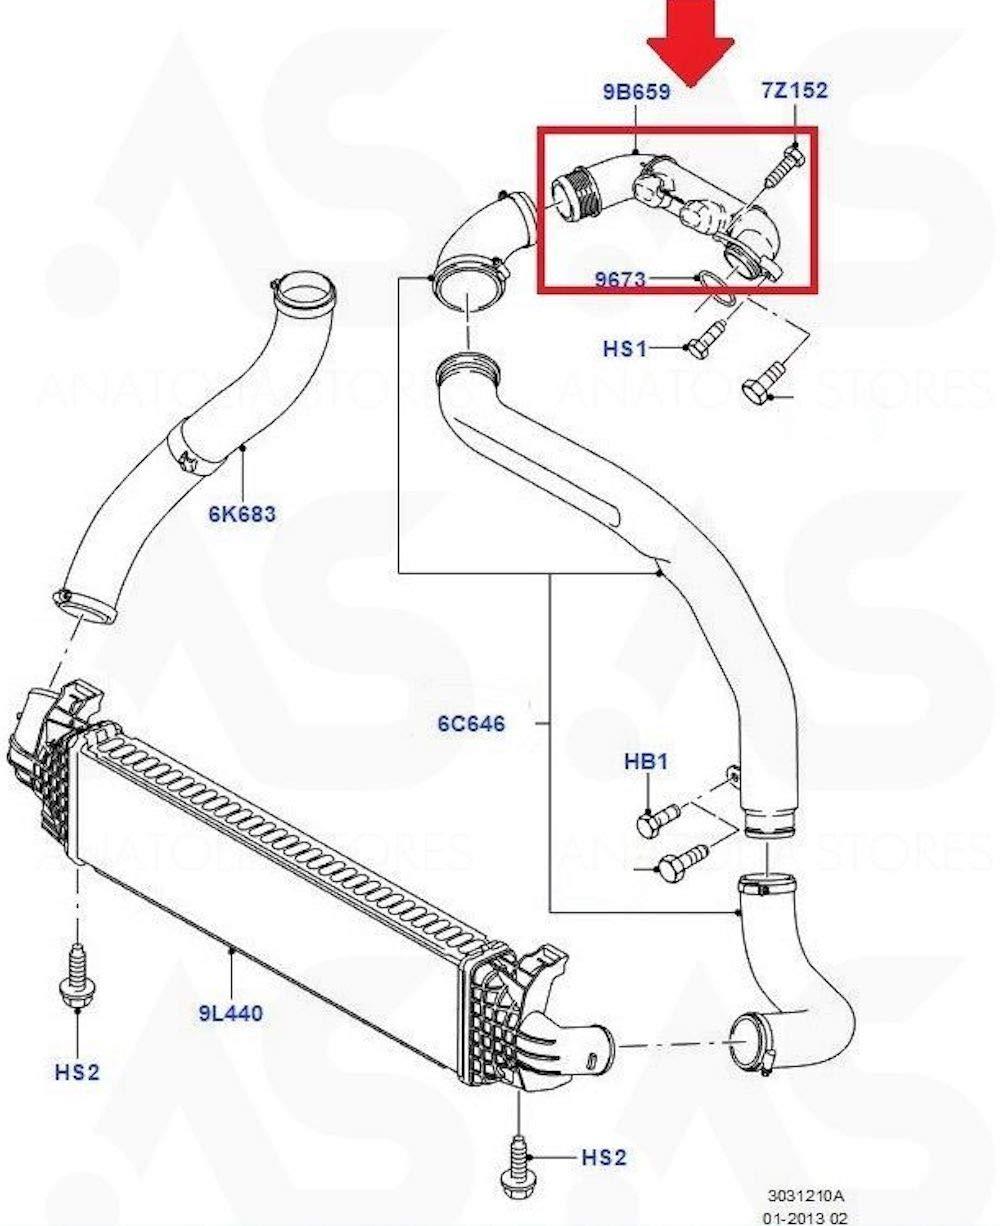 Manguera de tubo de admisión Air Turbo para Ford C-Max Focus Mk2 1.6 TDCi 1465155